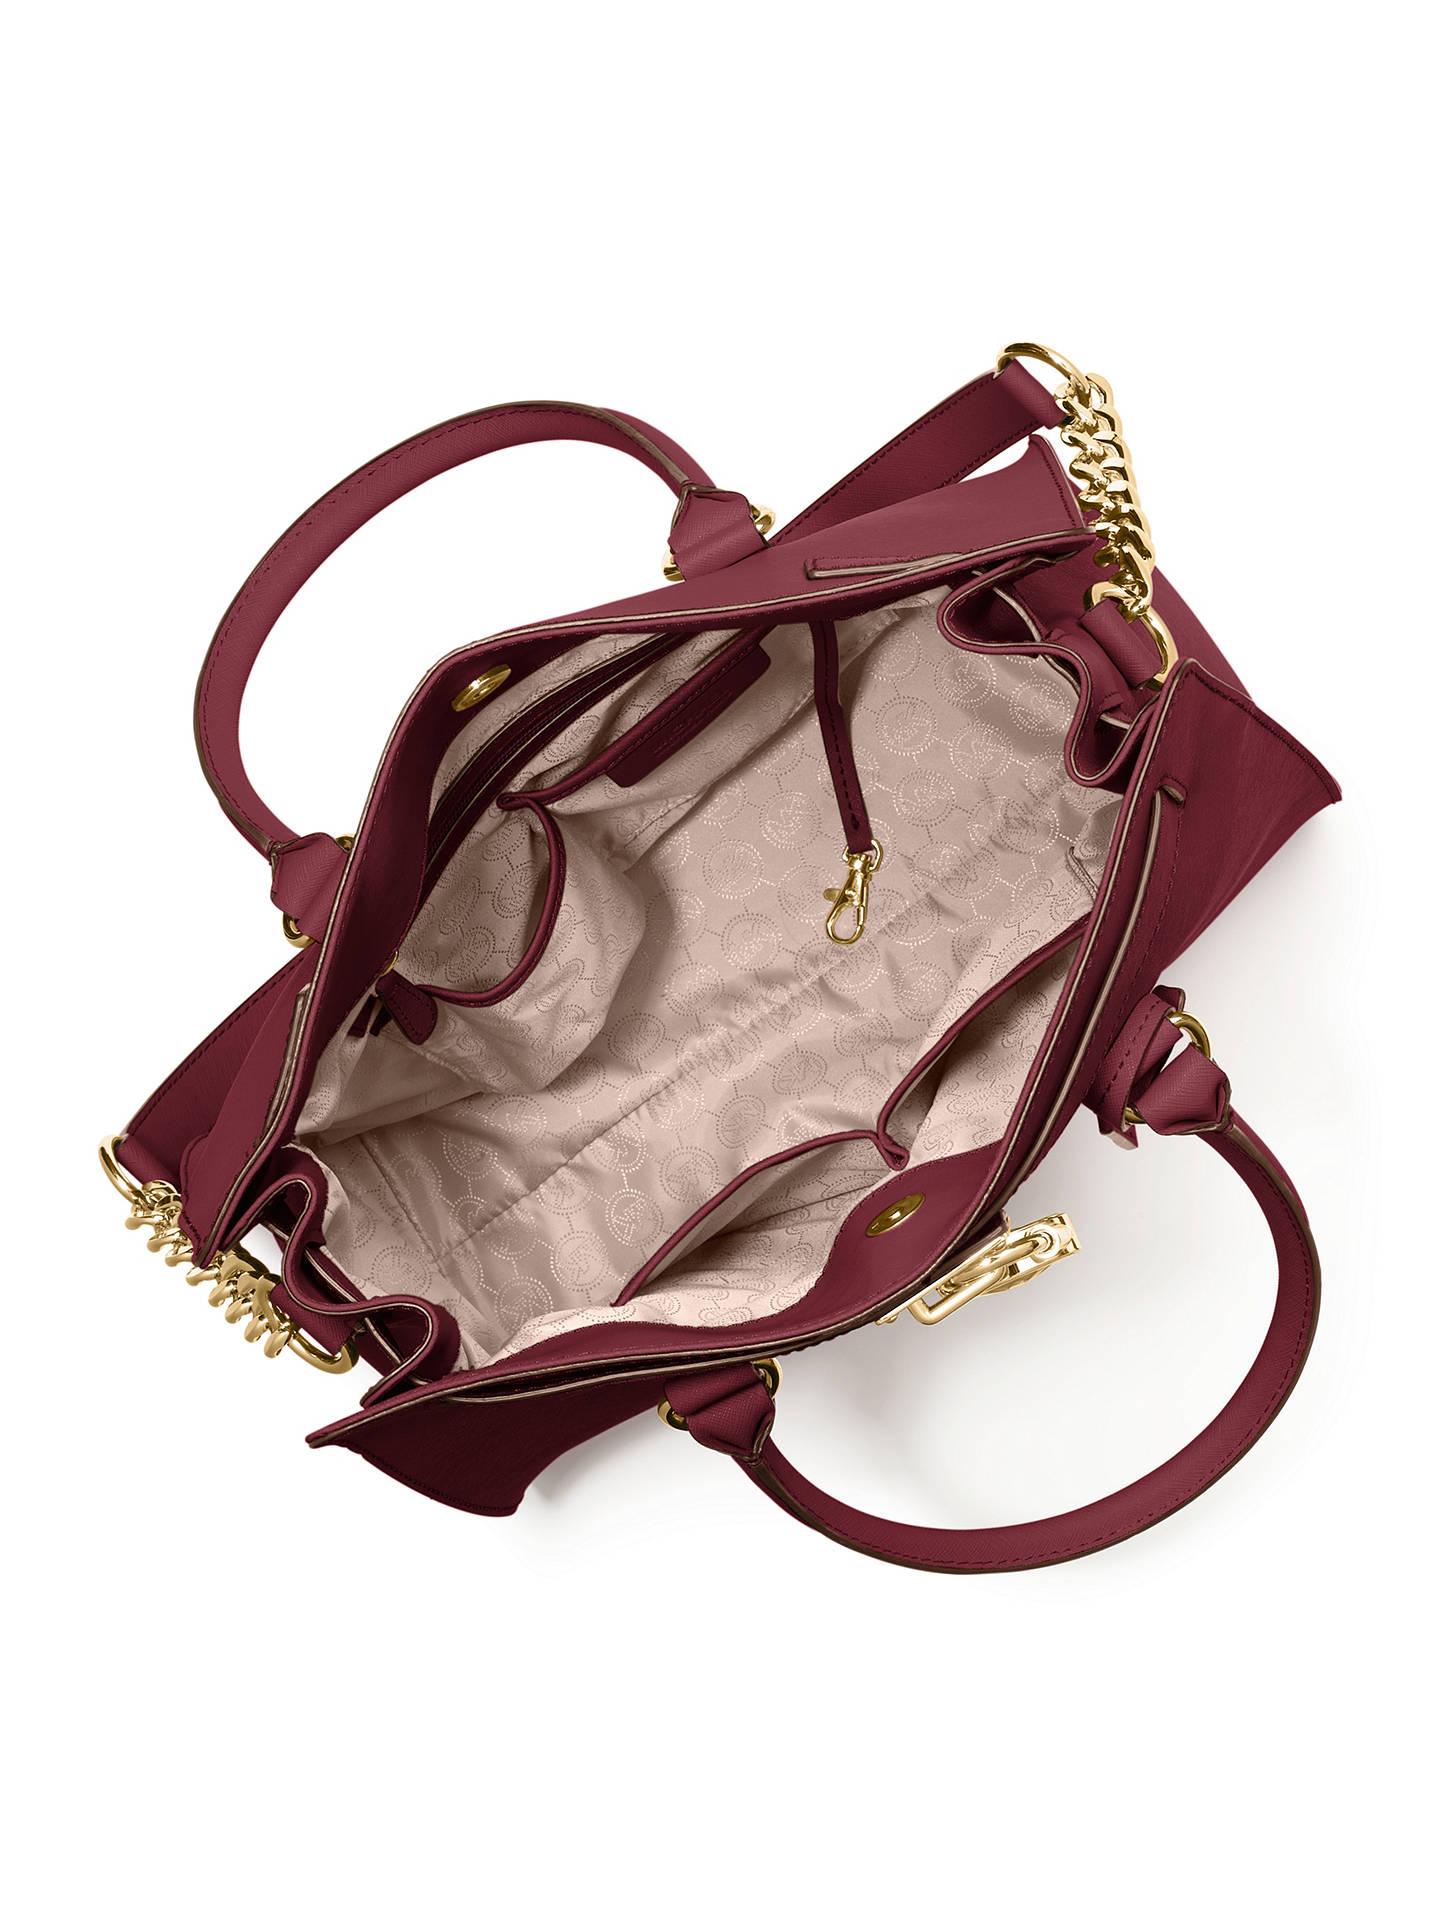 6af5bc581aa5c5 Buy MICHAEL Michael Kors Hamilton Large Saffiano Leather Tote Bag, Claret  Online at johnlewis.